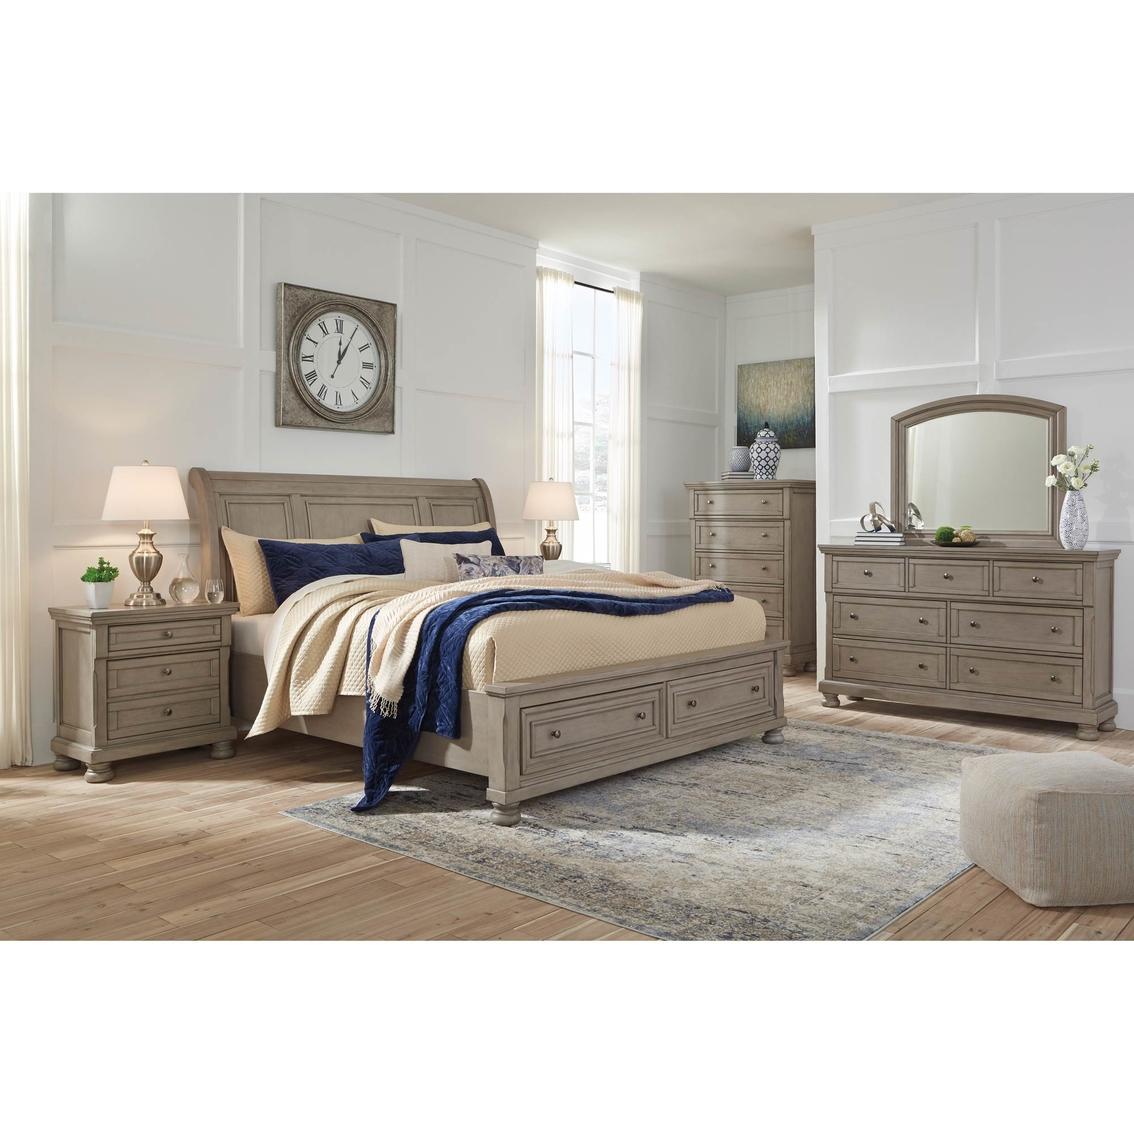 Signature Design By Ashley Lettner Storage Bed 5 Pc. Set ...